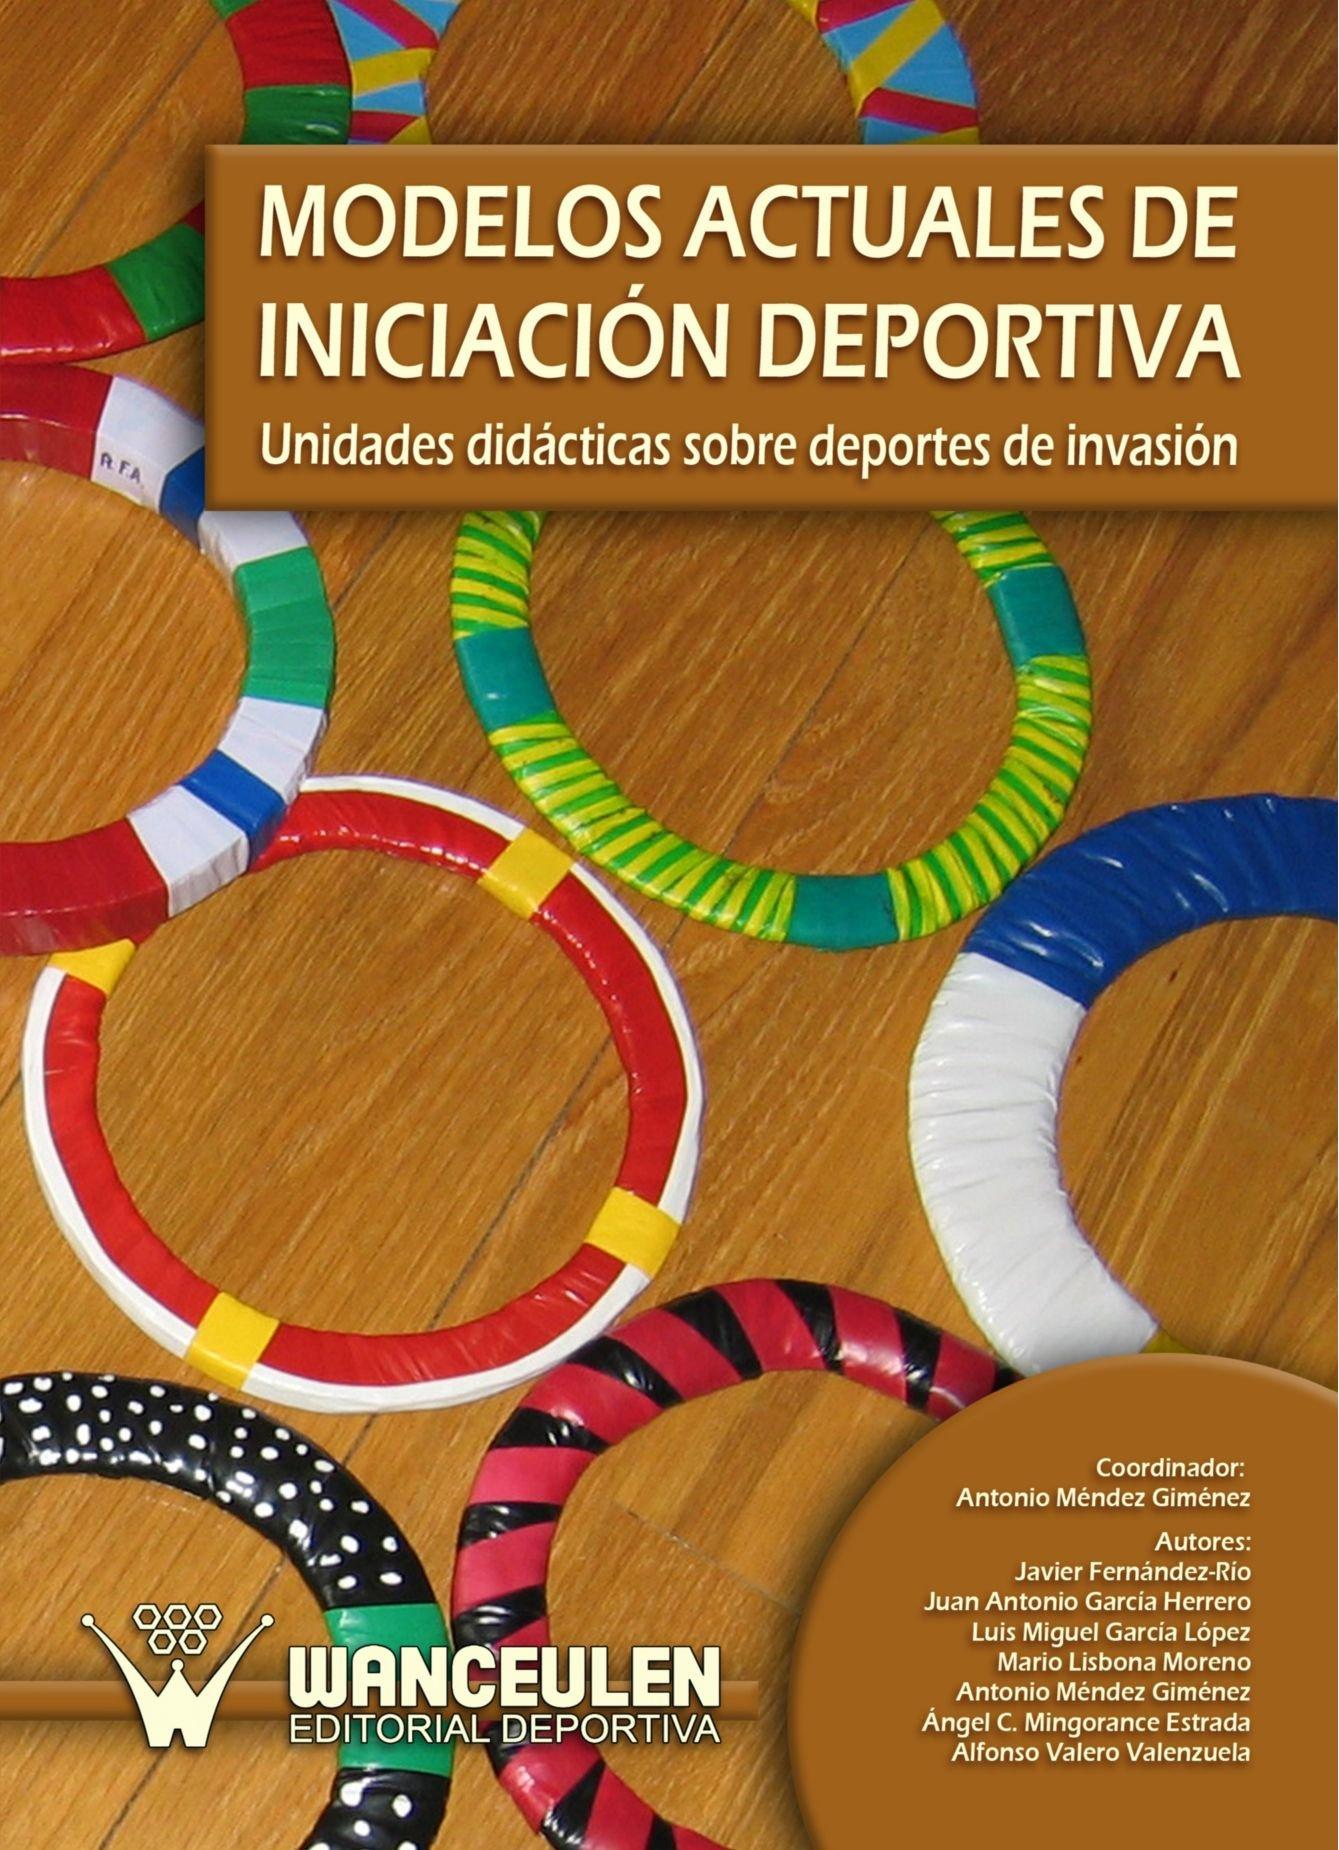 Modelos De Iniciacion Deportiva Tapa blanda – 8 dic 2009 Antonio Méndez Gutiérrez Wanceulen Editorial S.L. 8498232783 Gimnasia